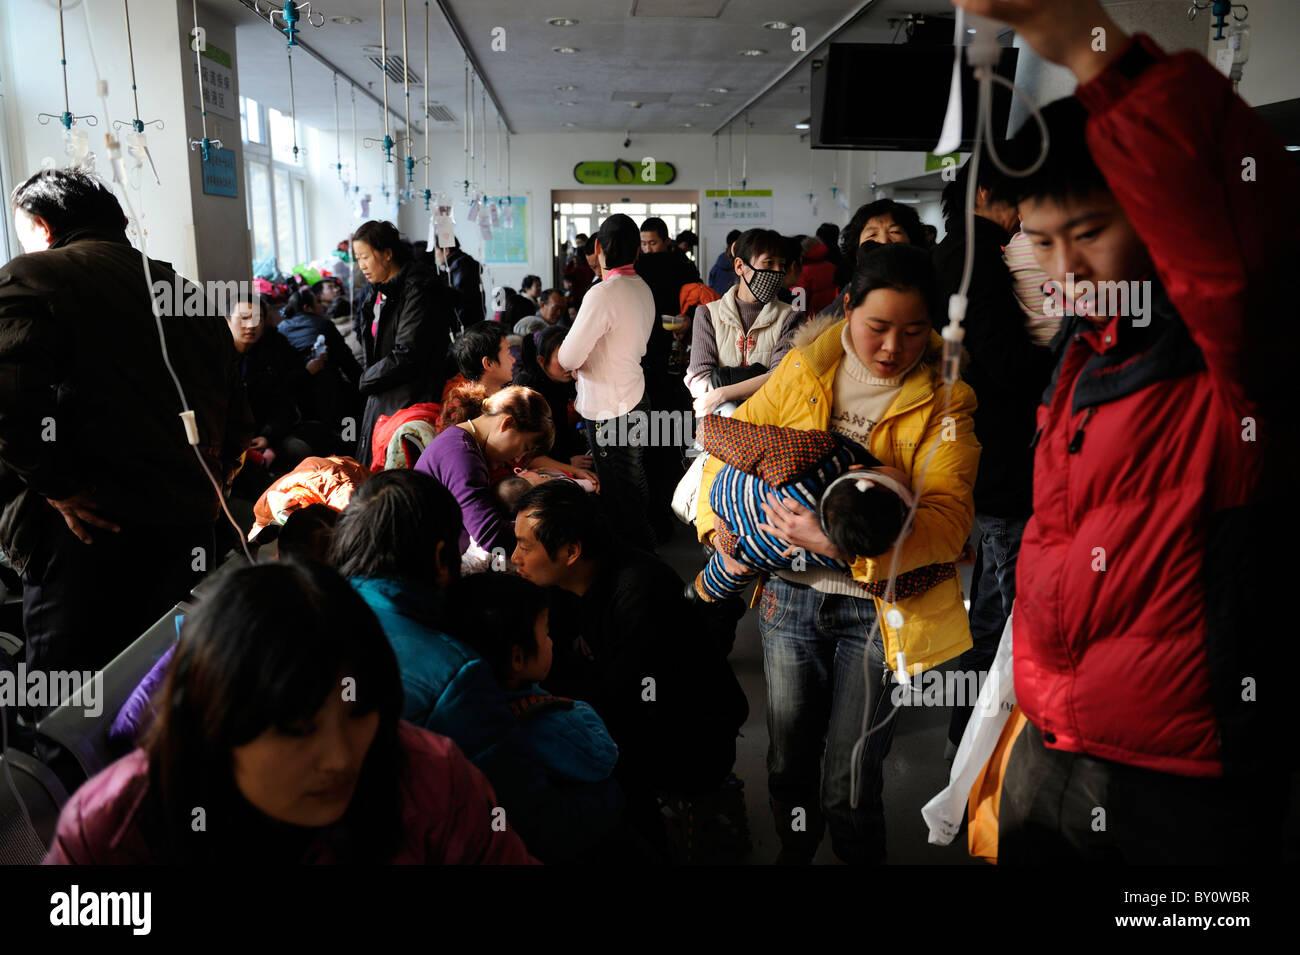 Chinesische Kinder erhalten Transfusion im Kinderkrankenhaus in Peking, China.12-Jan-2011 Stockbild